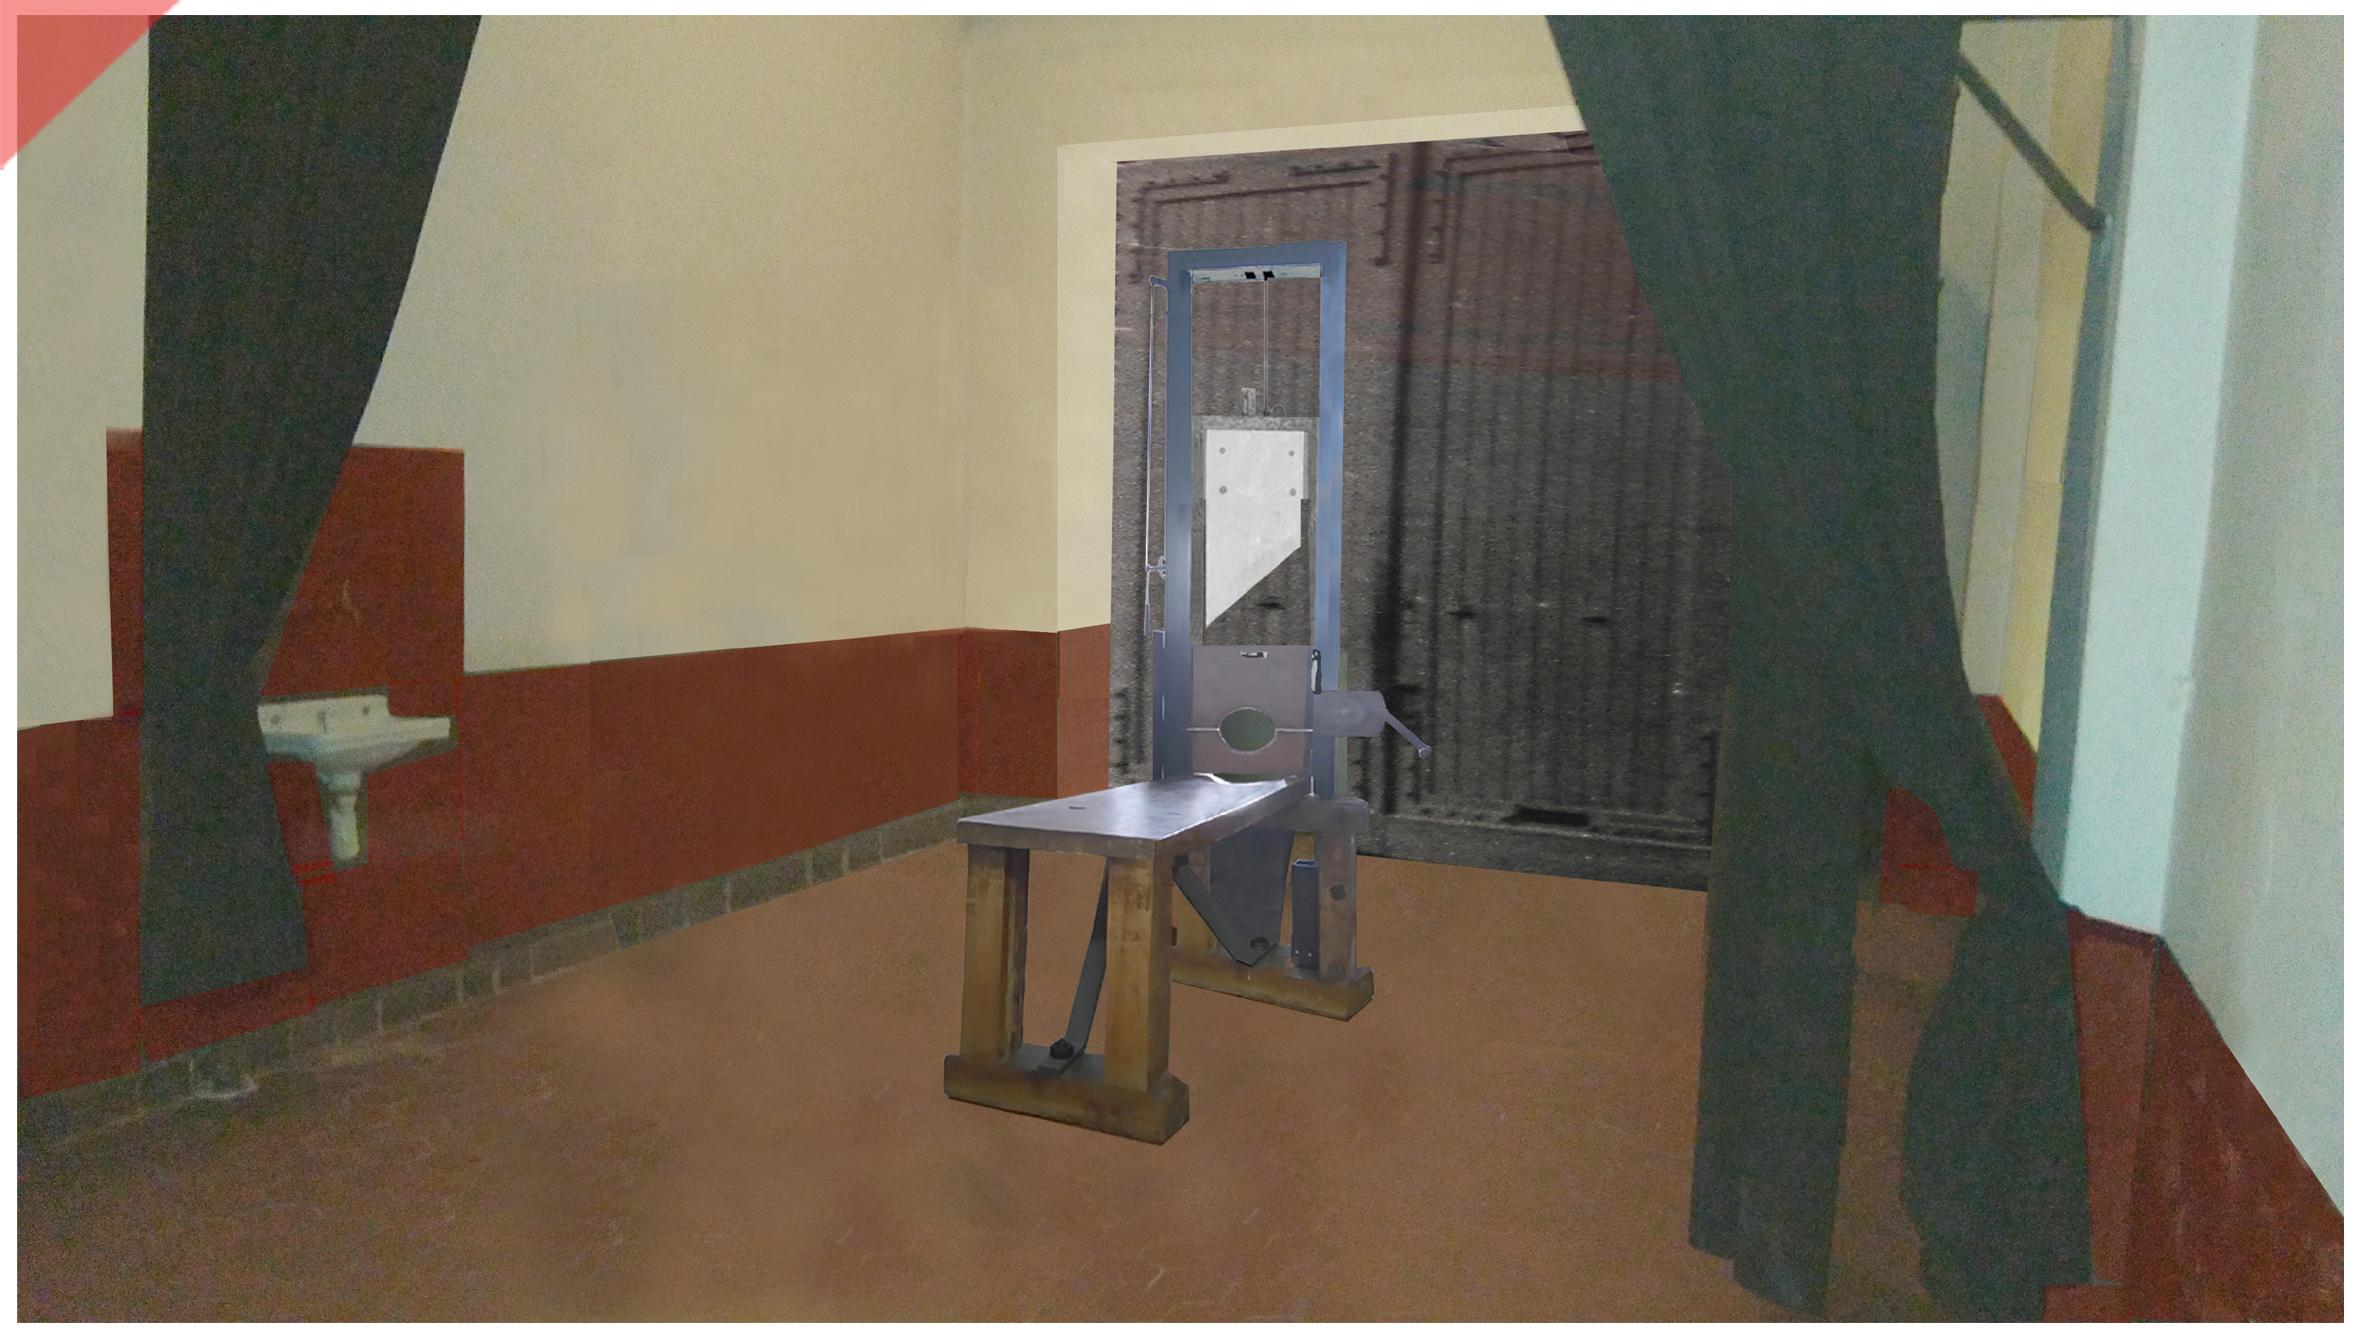 Brandenburg-Görden-Goerden-prison-German-Fallbeil-Modell-T-Mannhardt-Guillotine-Röttger-Roettger-Garage